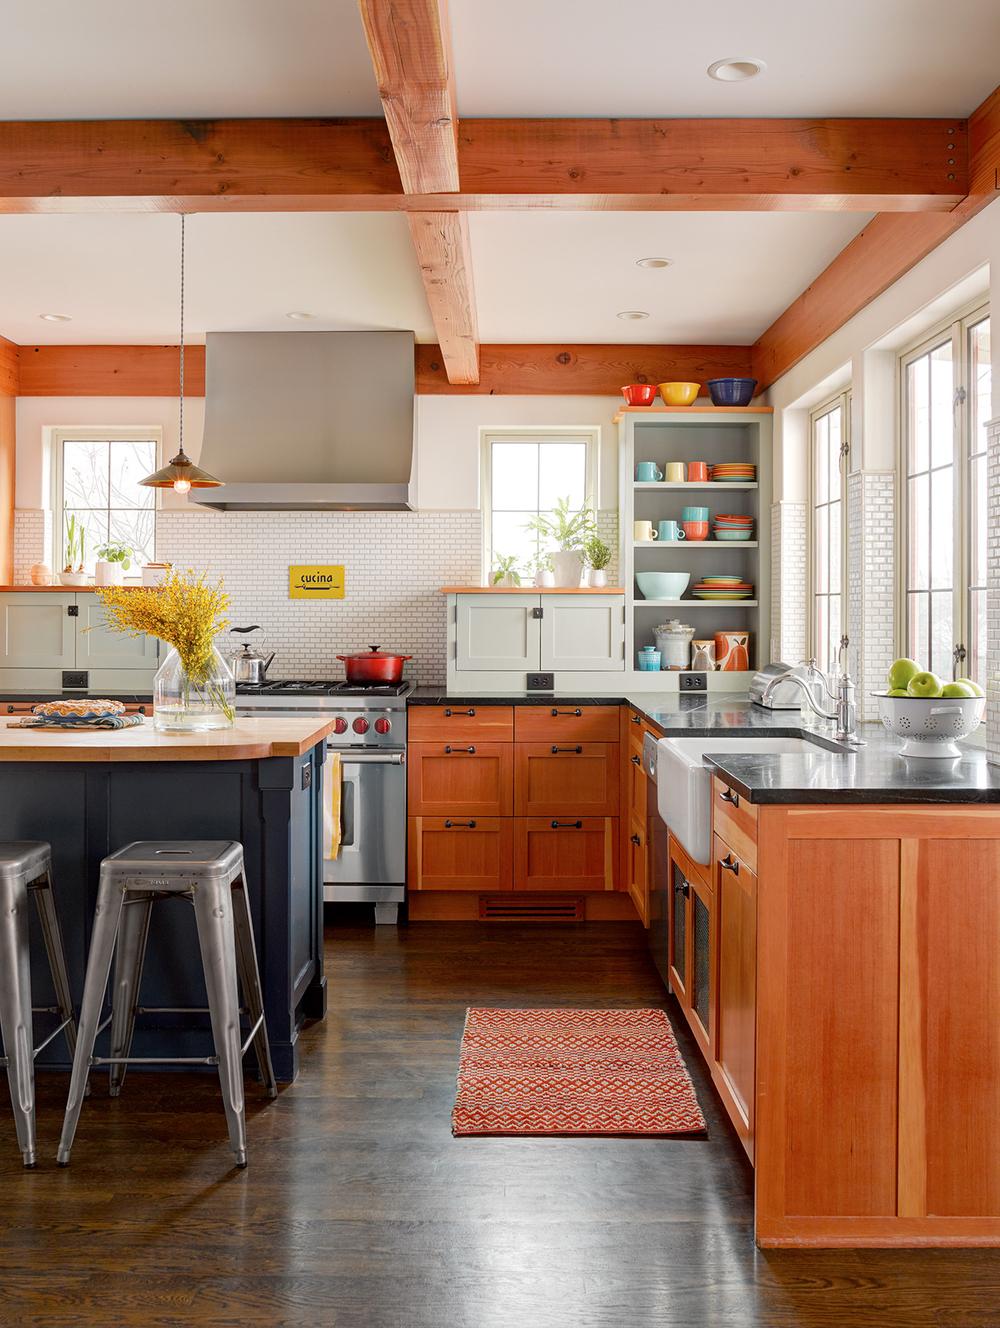 8 this-old-house-blaine-kitchen-2.jpg